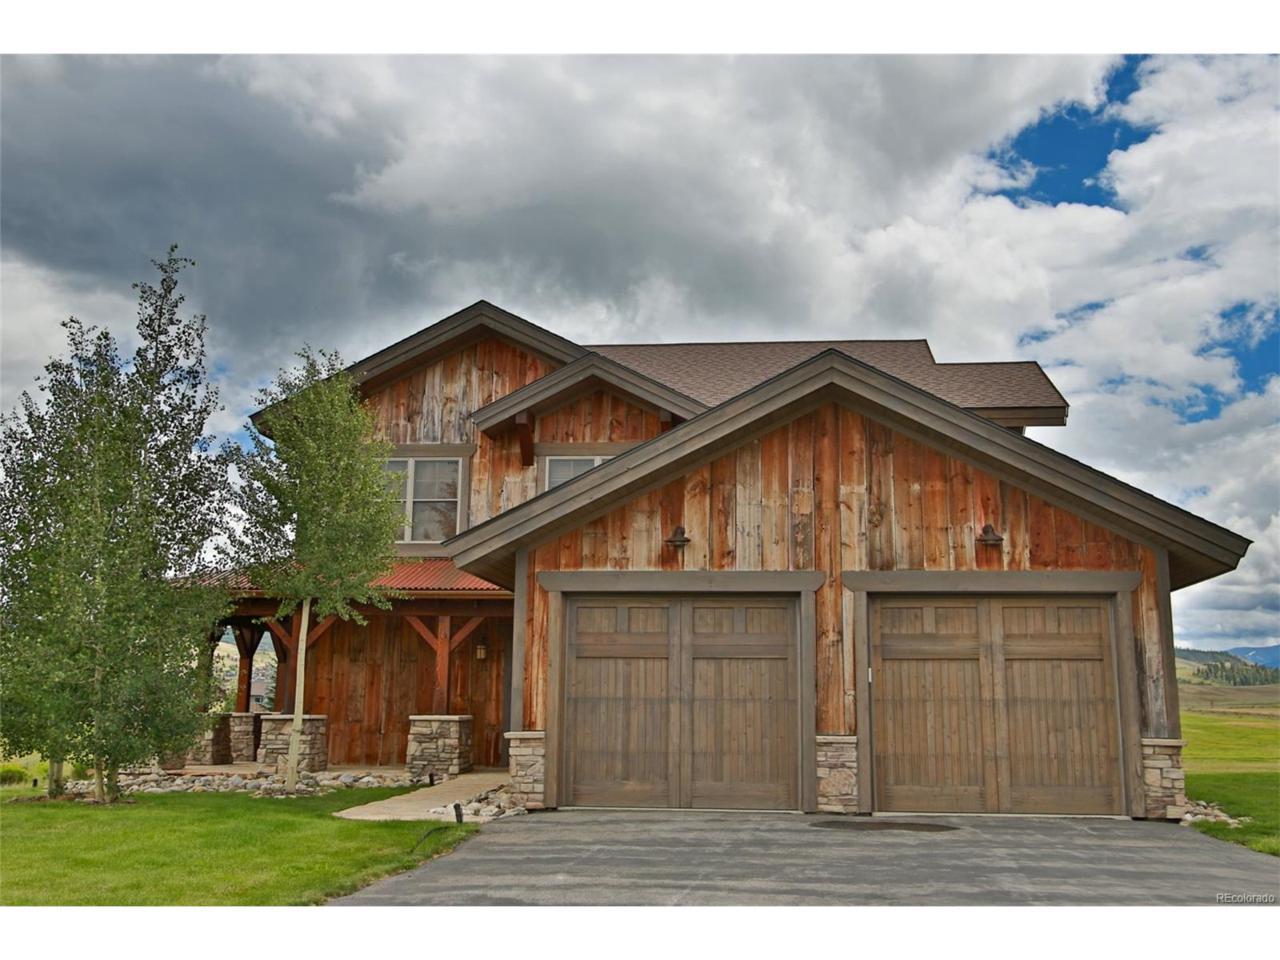 1461 Wildhorse Drive, Granby, CO 80446 (MLS #5881372) :: 8z Real Estate